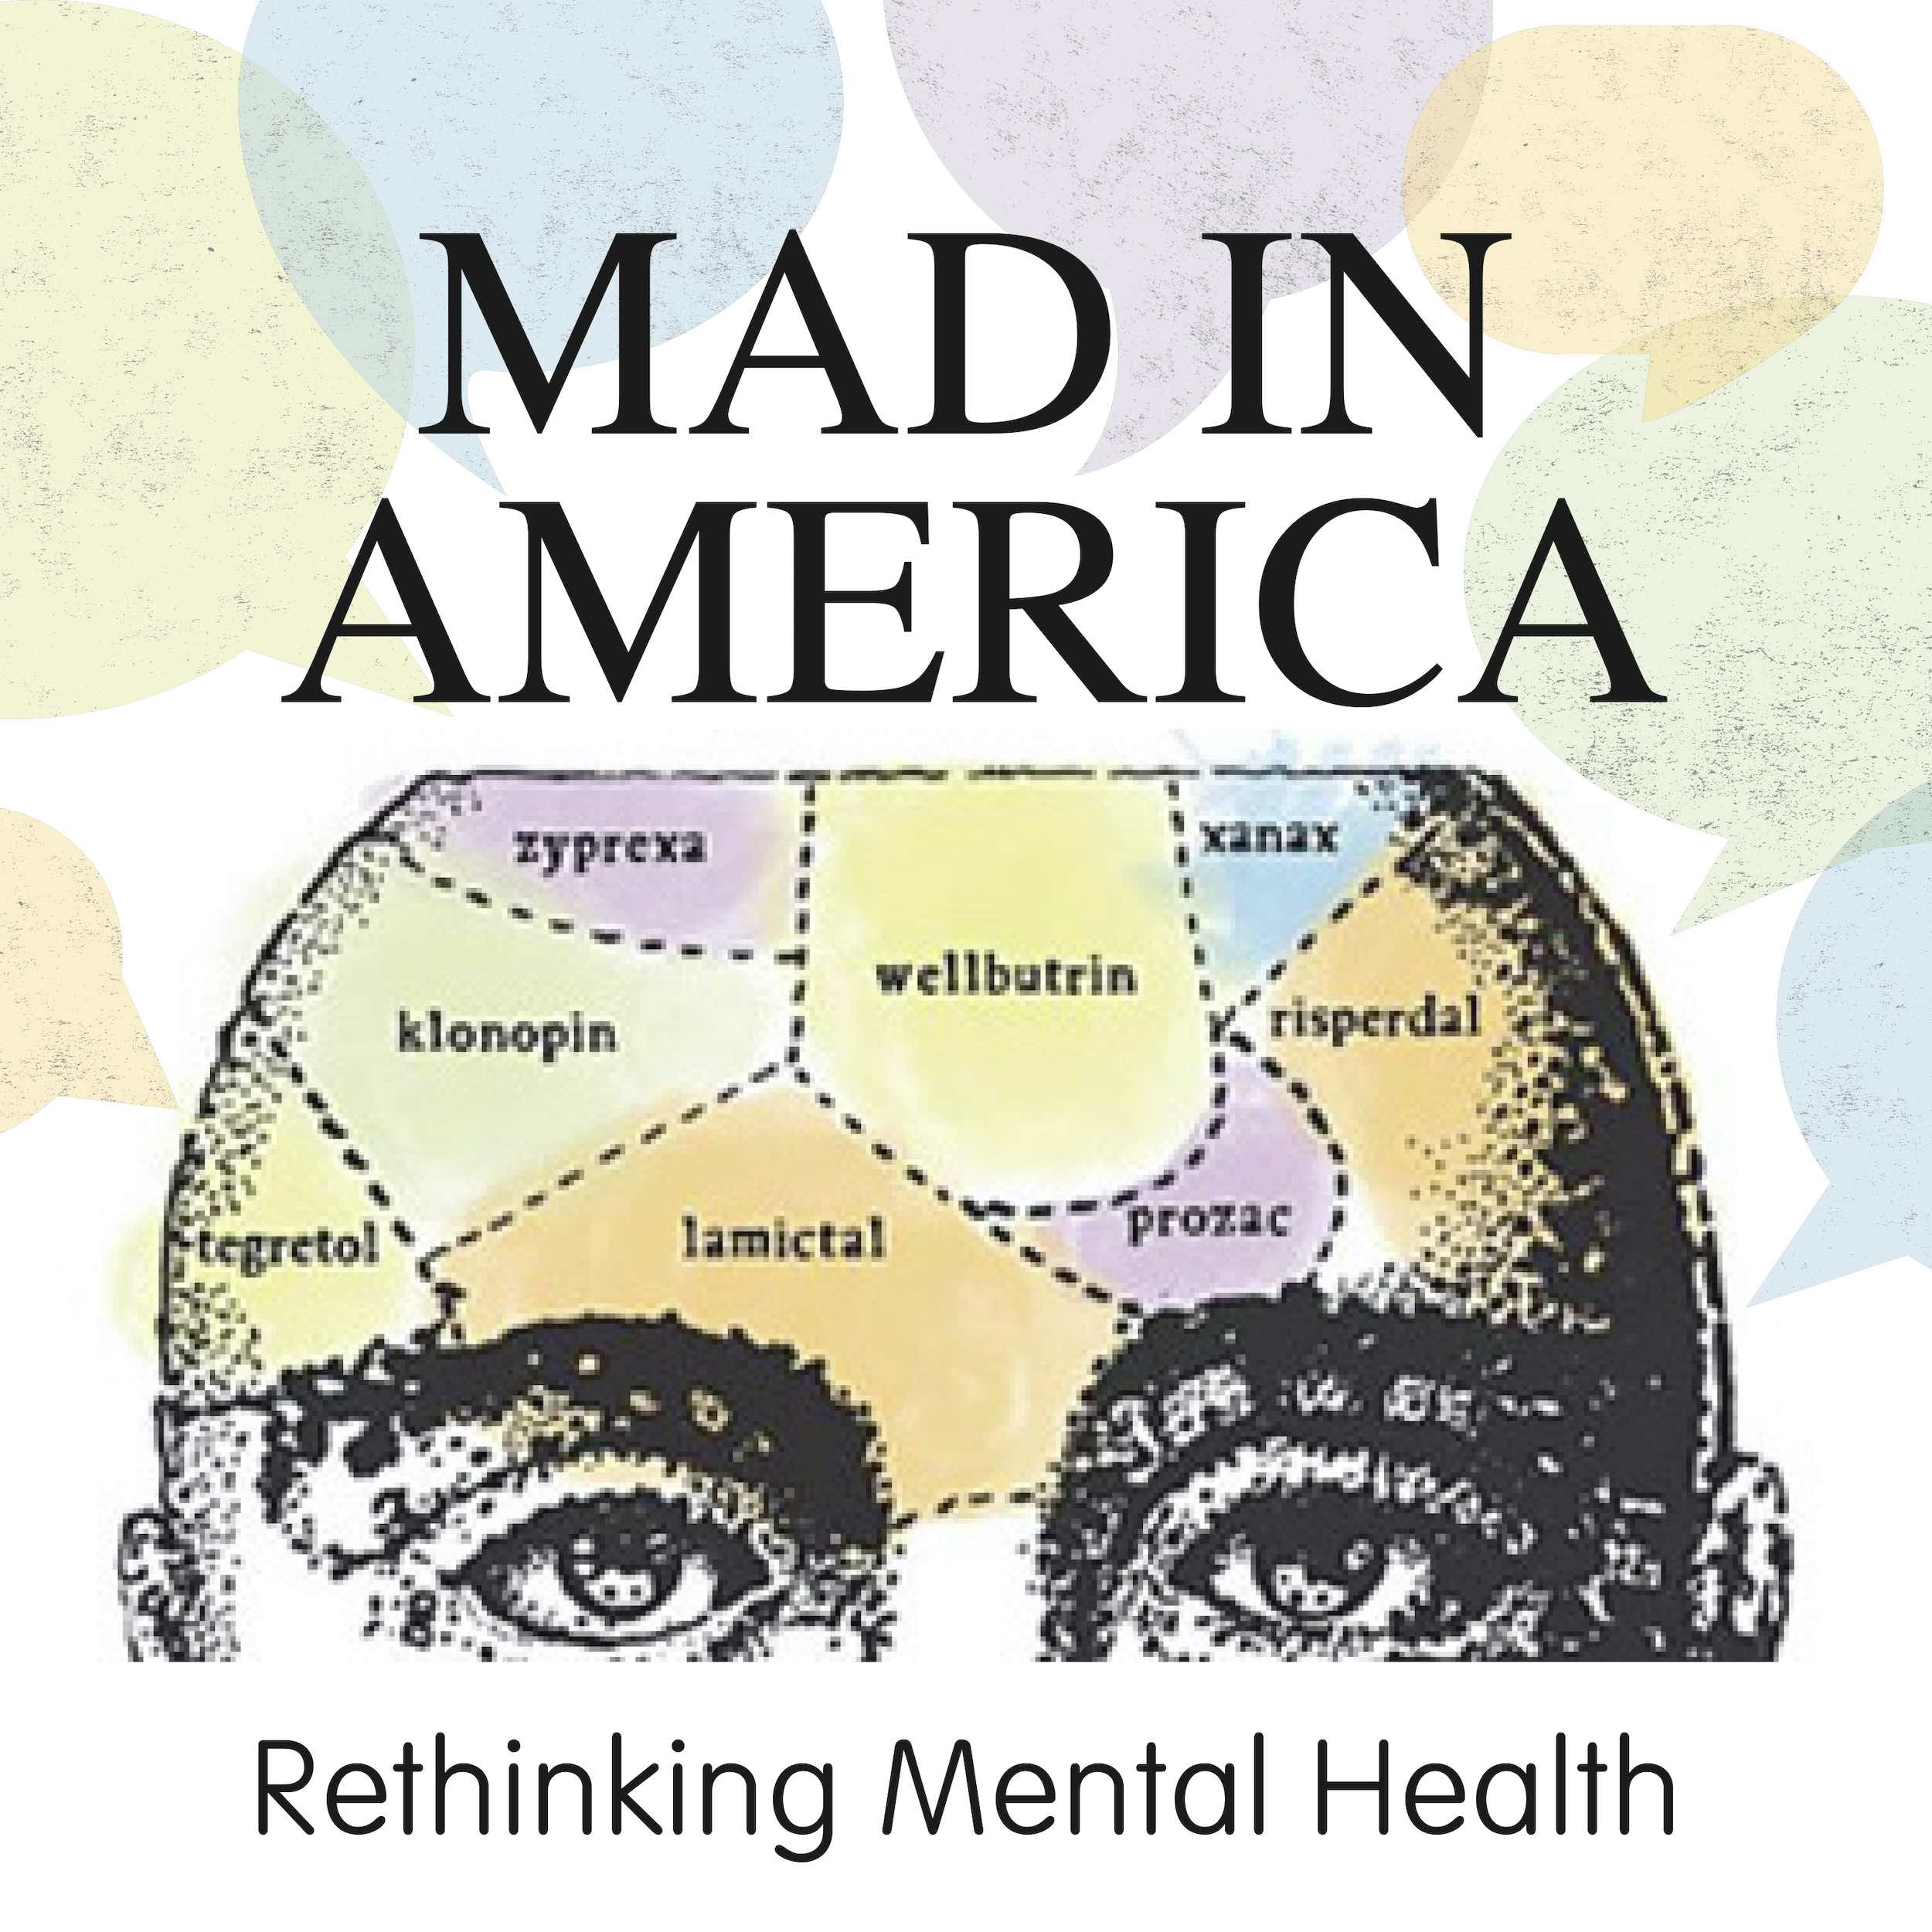 Mad in America: Rethinking Mental Health - Peter Statsny - Reimagining Psychiatry